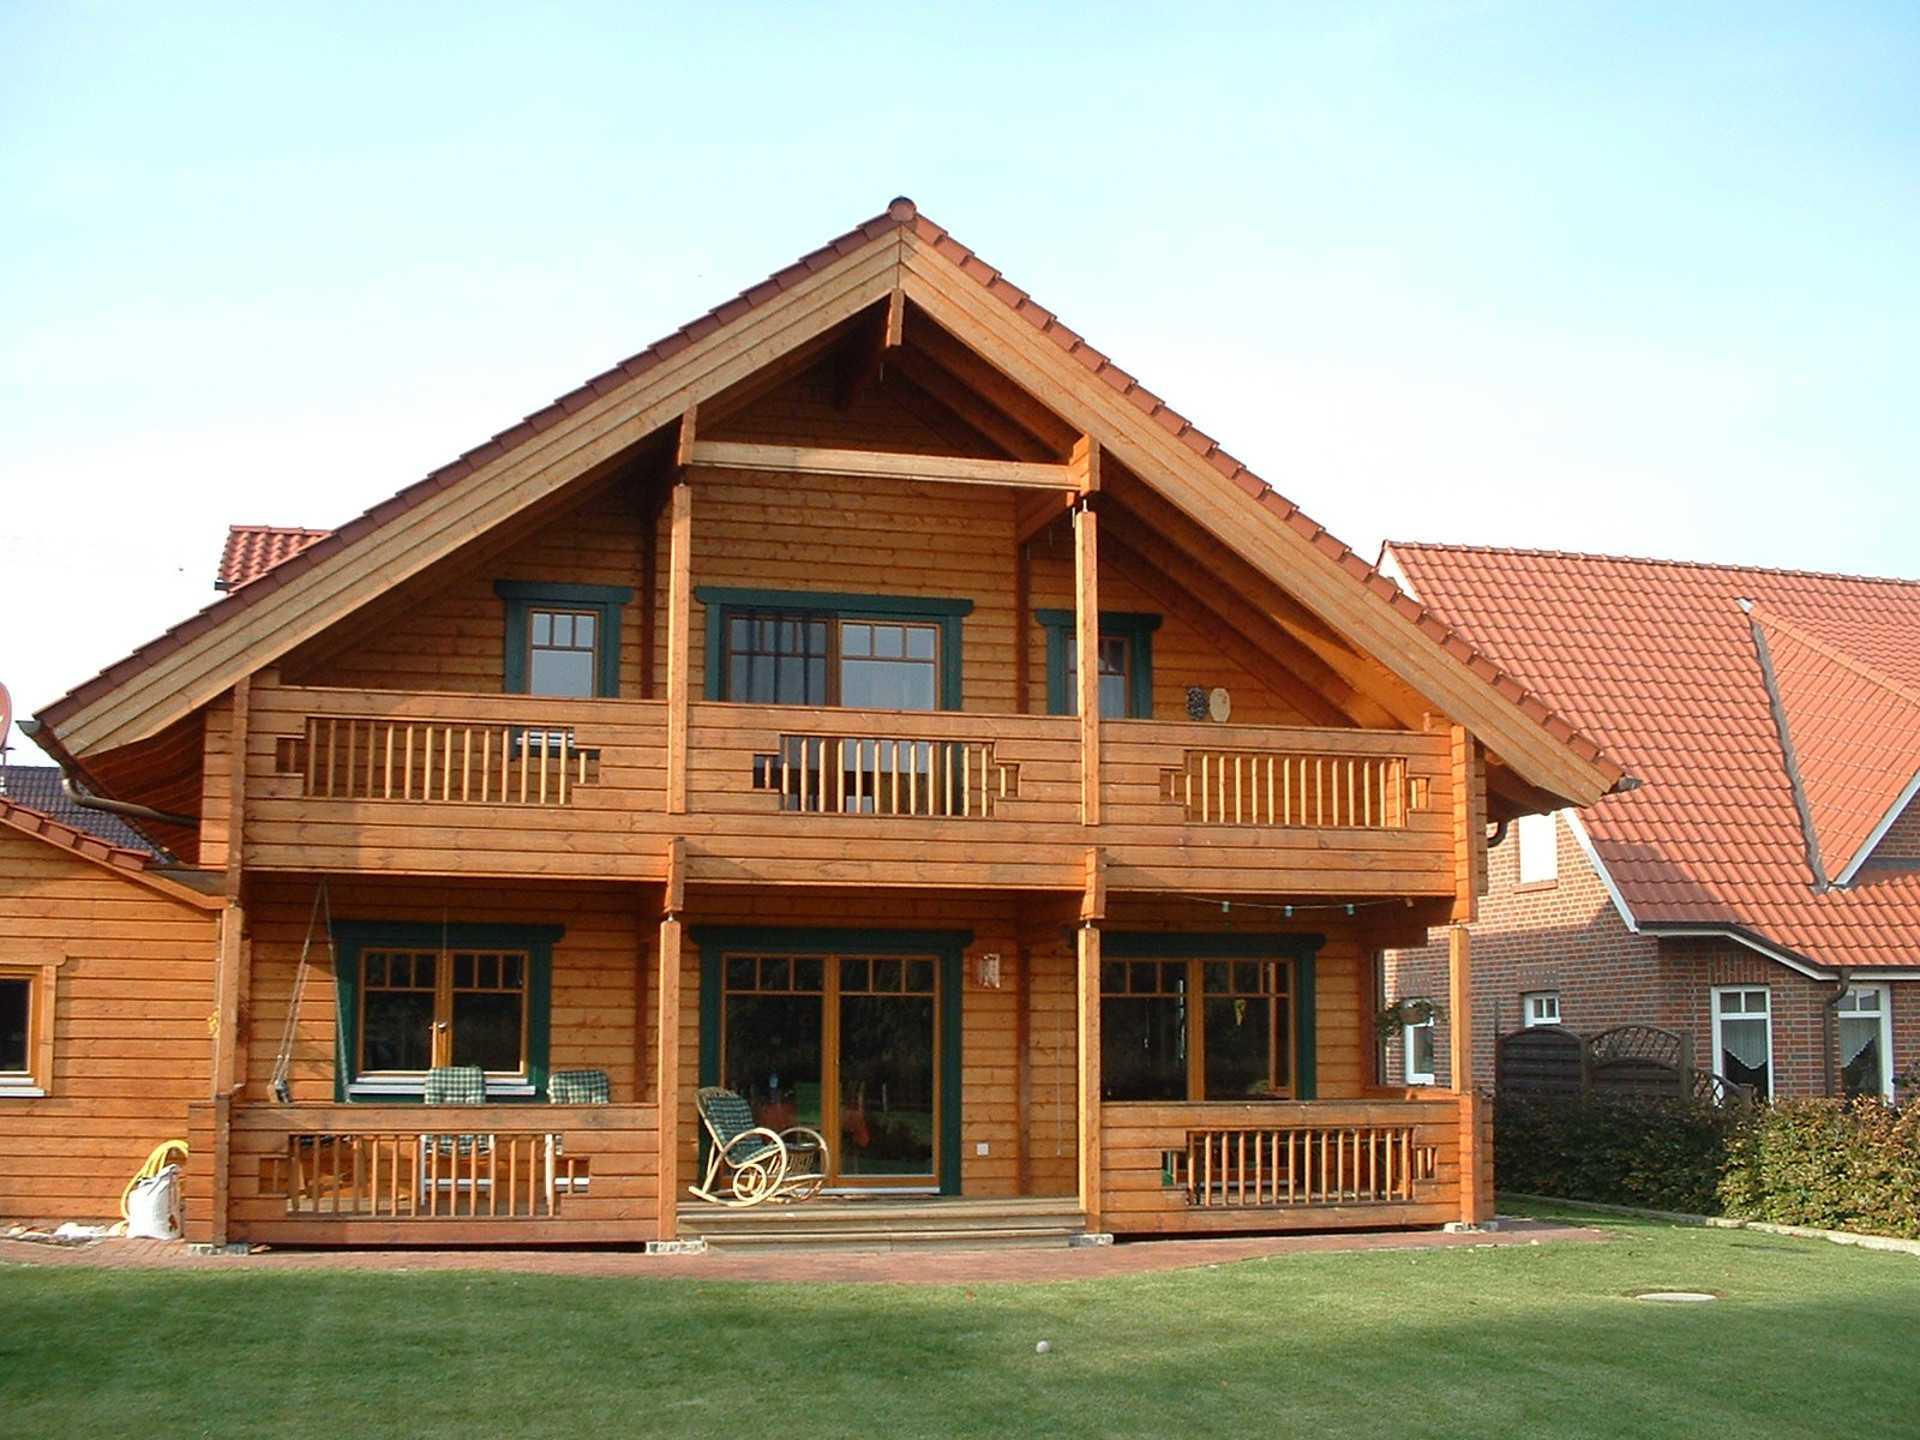 Haus Van Aersen von Nordic-Haus